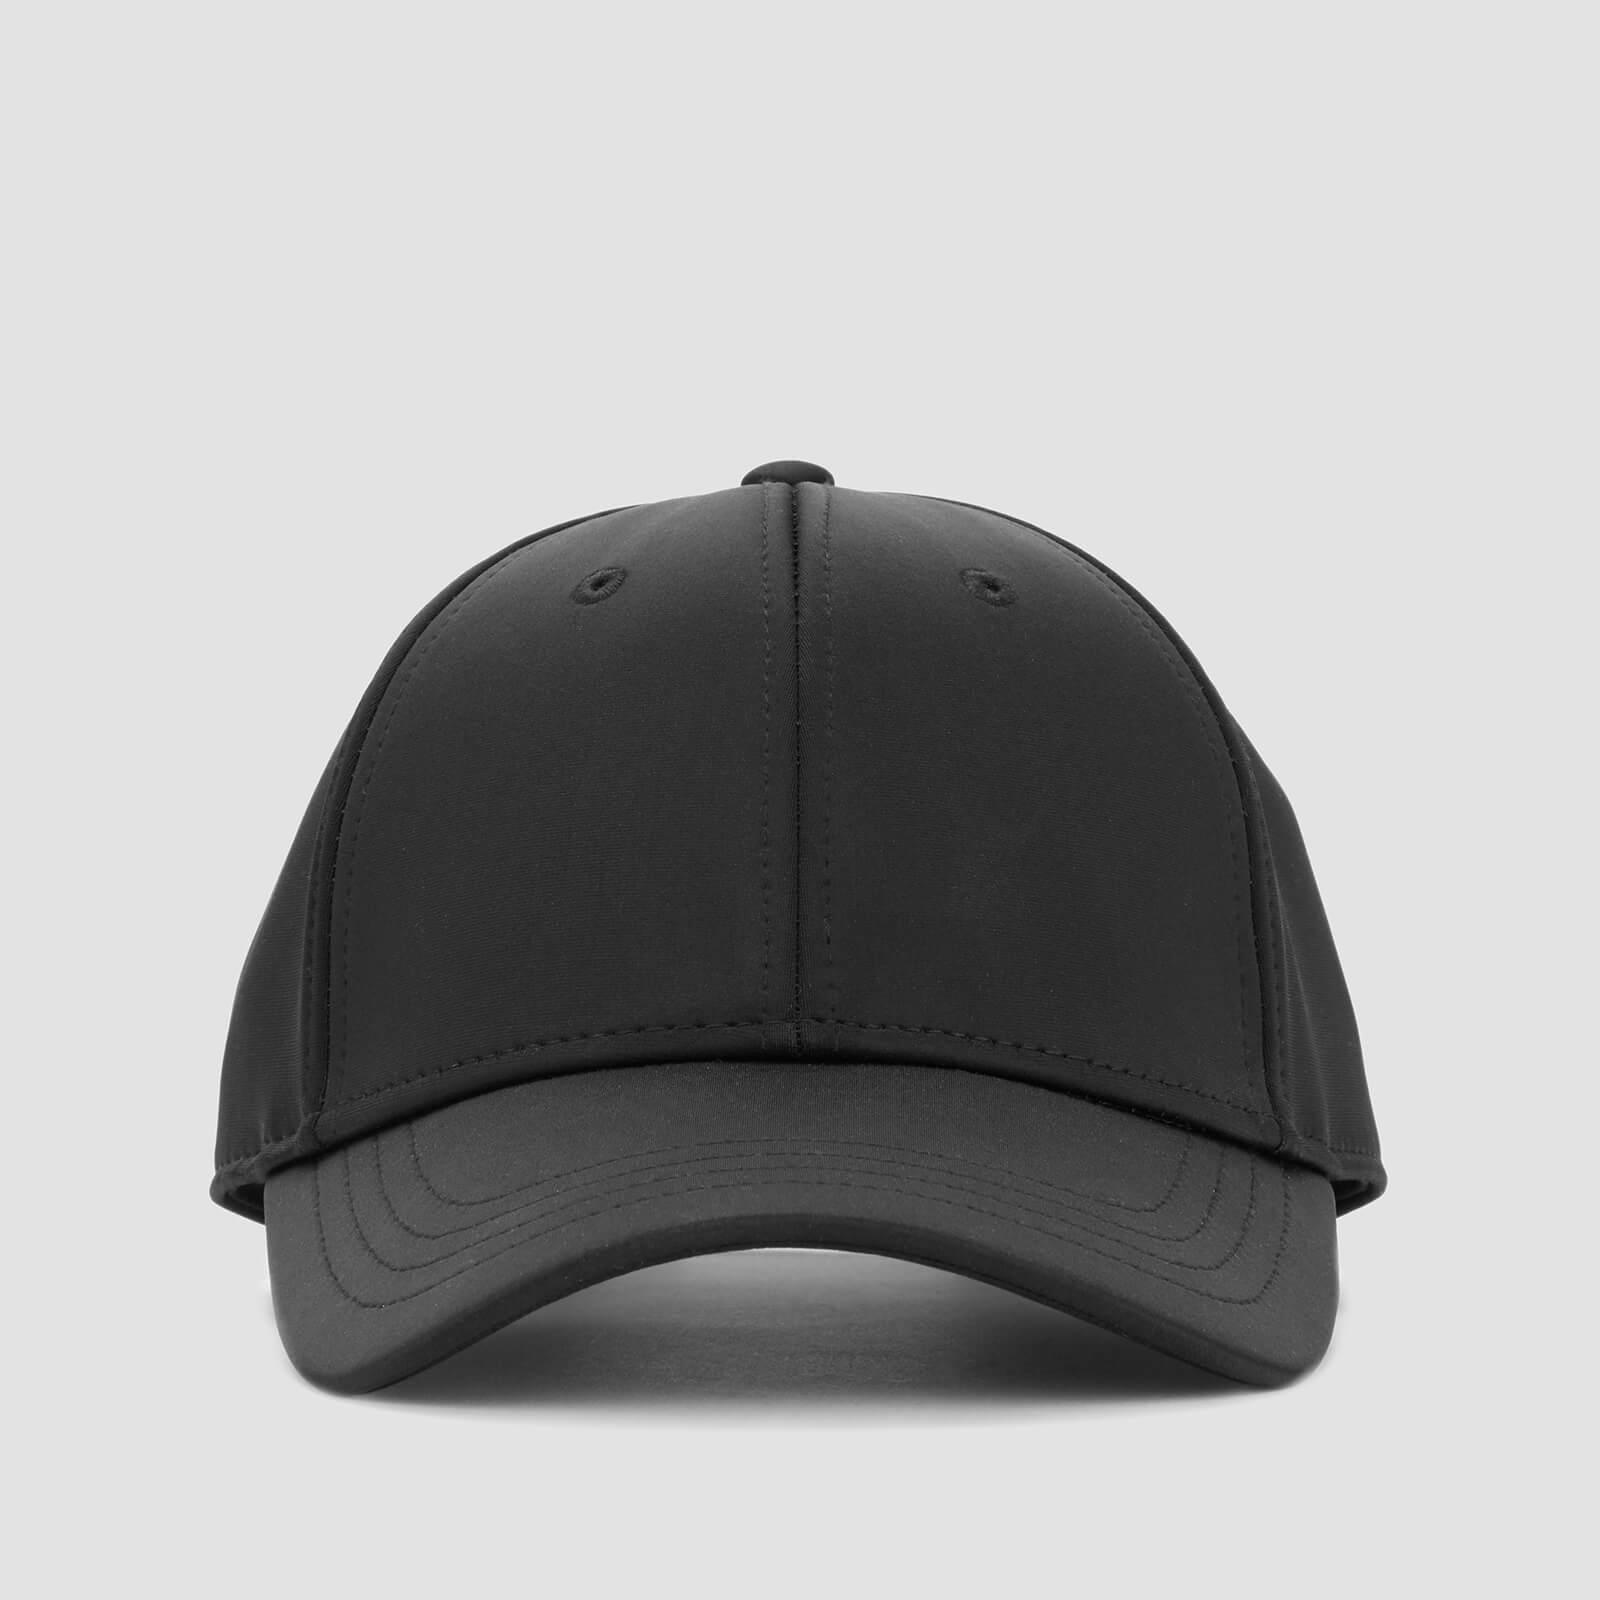 Myprotein MP Women's Baseball Cap - Black